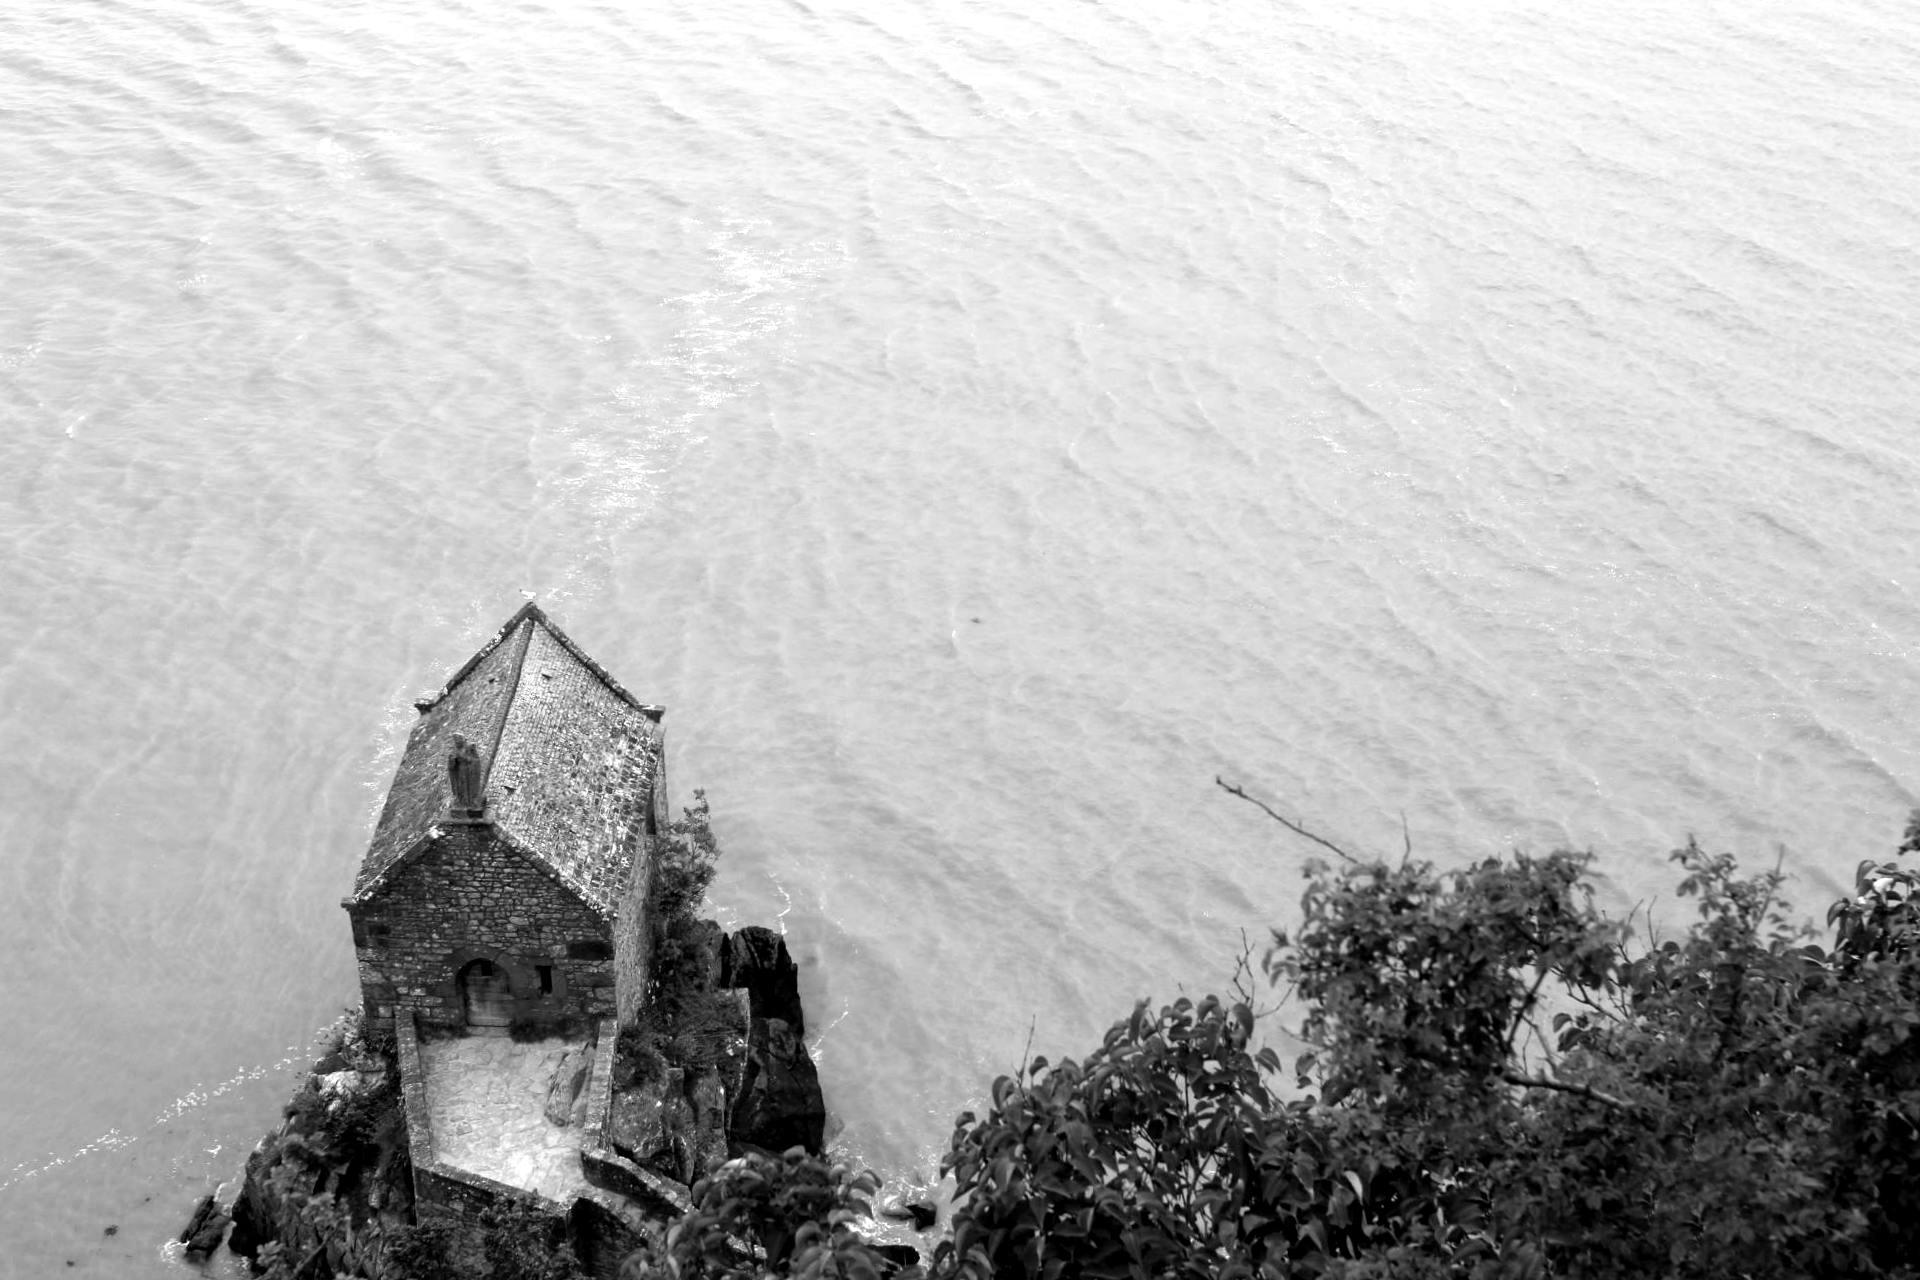 vue abbaye mont saint michel 3